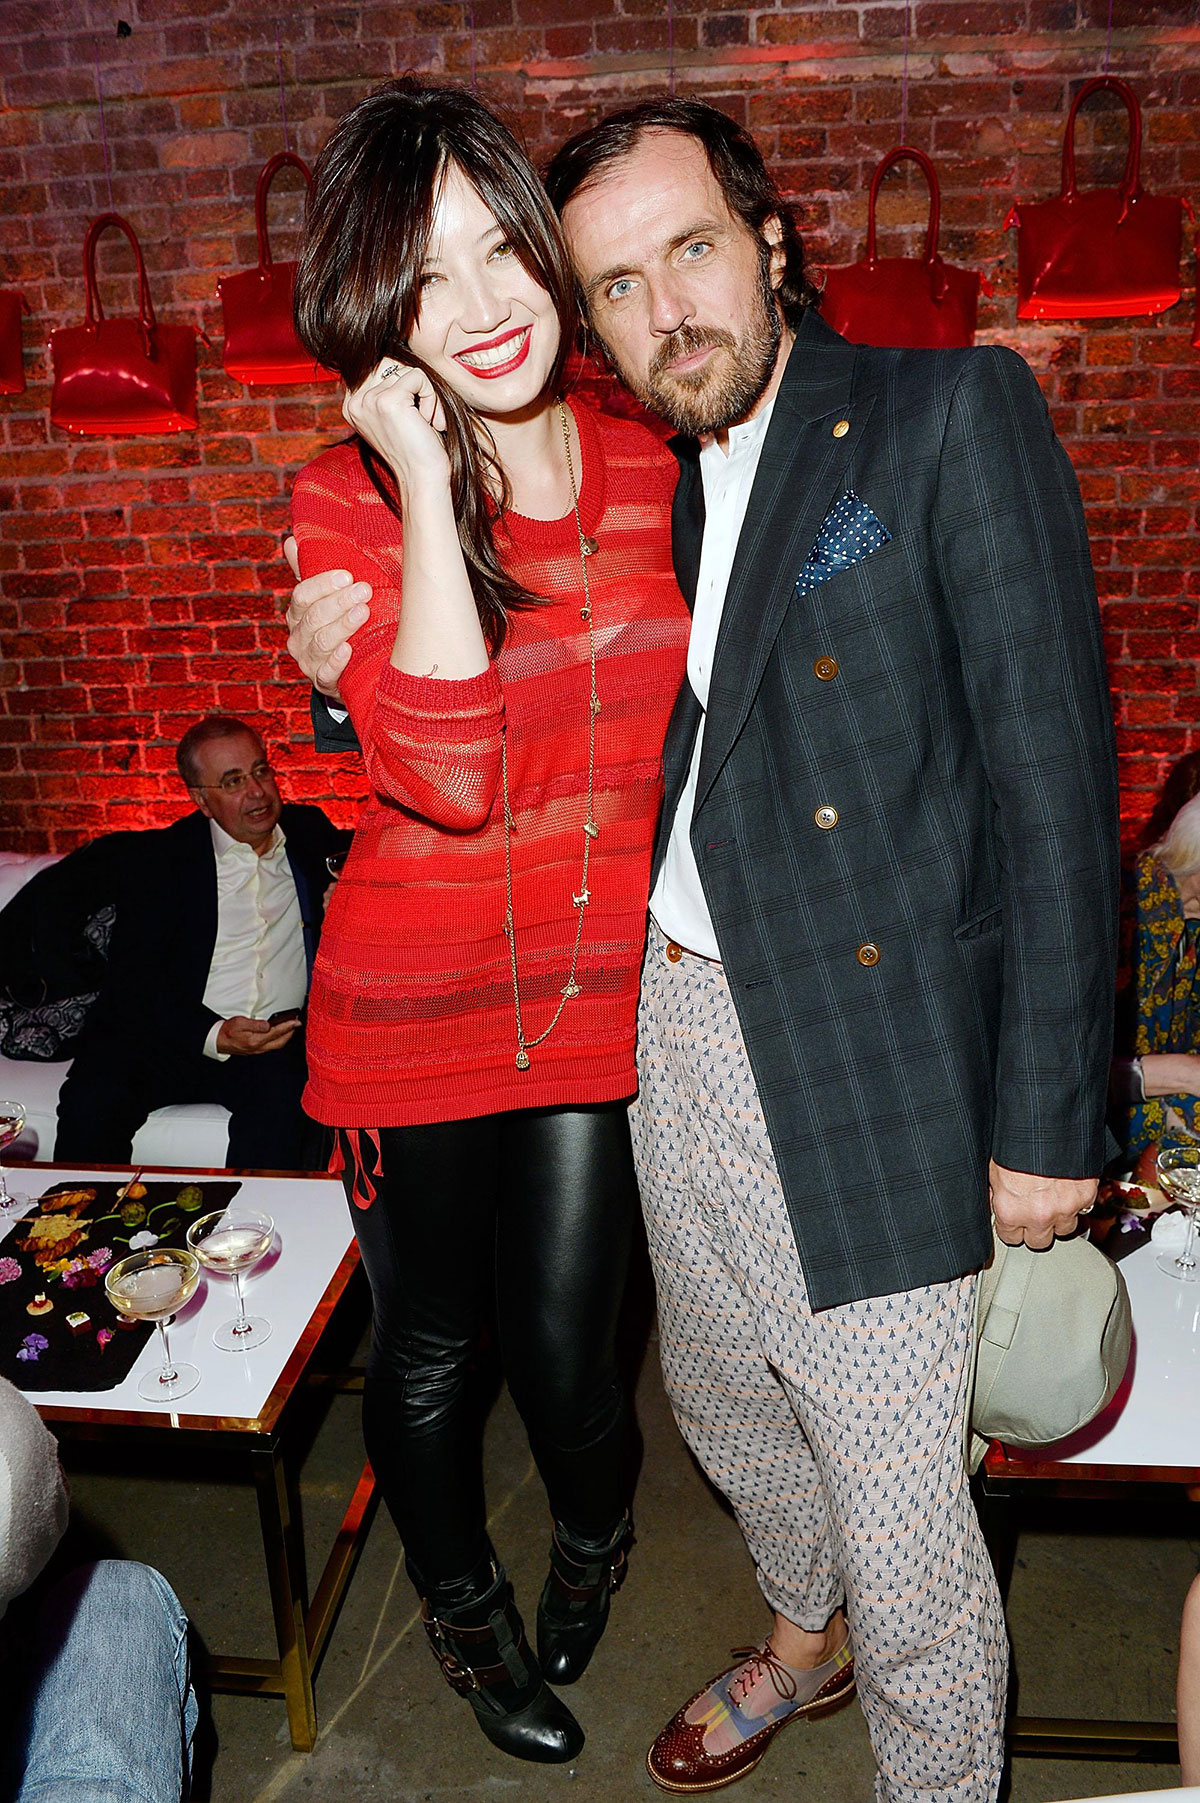 Daisy Lowe at Virgin Atlantic's New Vivienne Westwood Uniform Collection